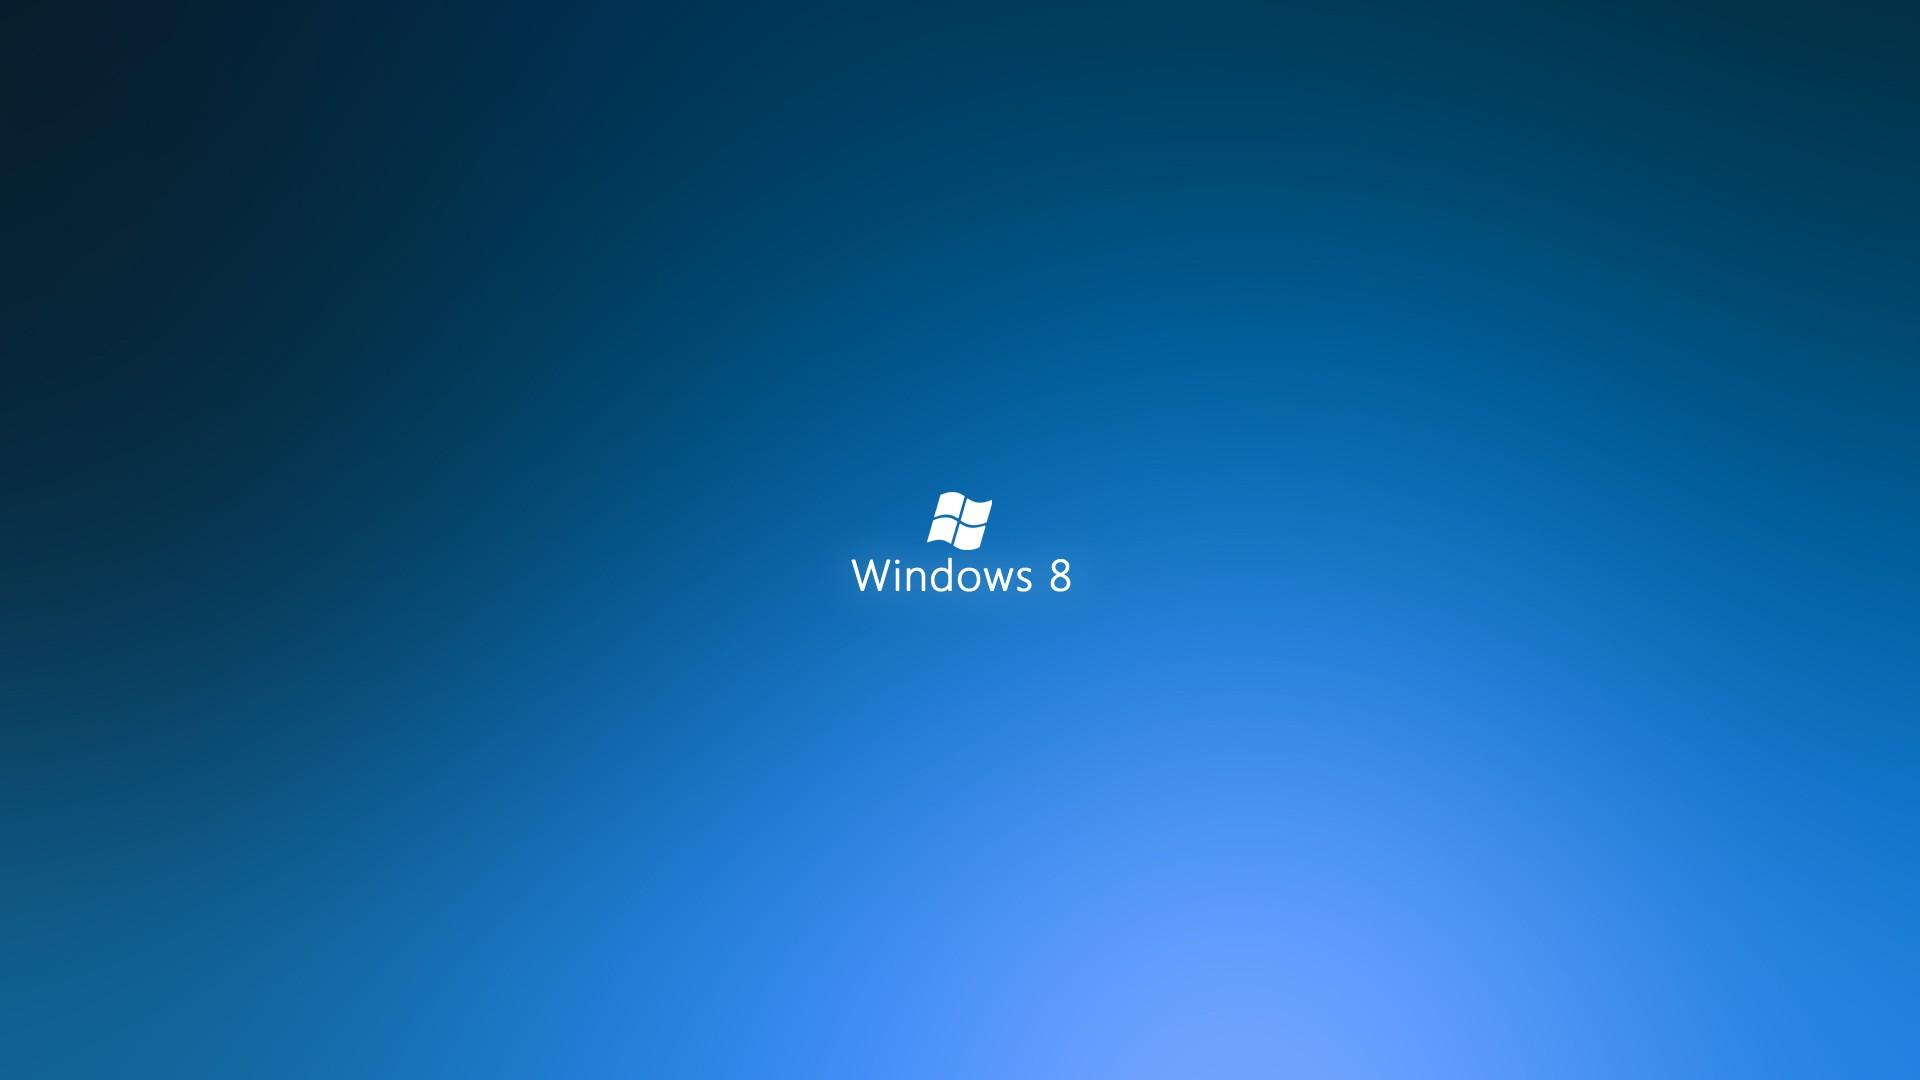 Windows 8, windows 8 wallpapers, Windows 8 stunning wallpapers, Windows 8 wallpapers, Download free Windows 8 wallpapers, Download Windows 8 wallpaper, (6)